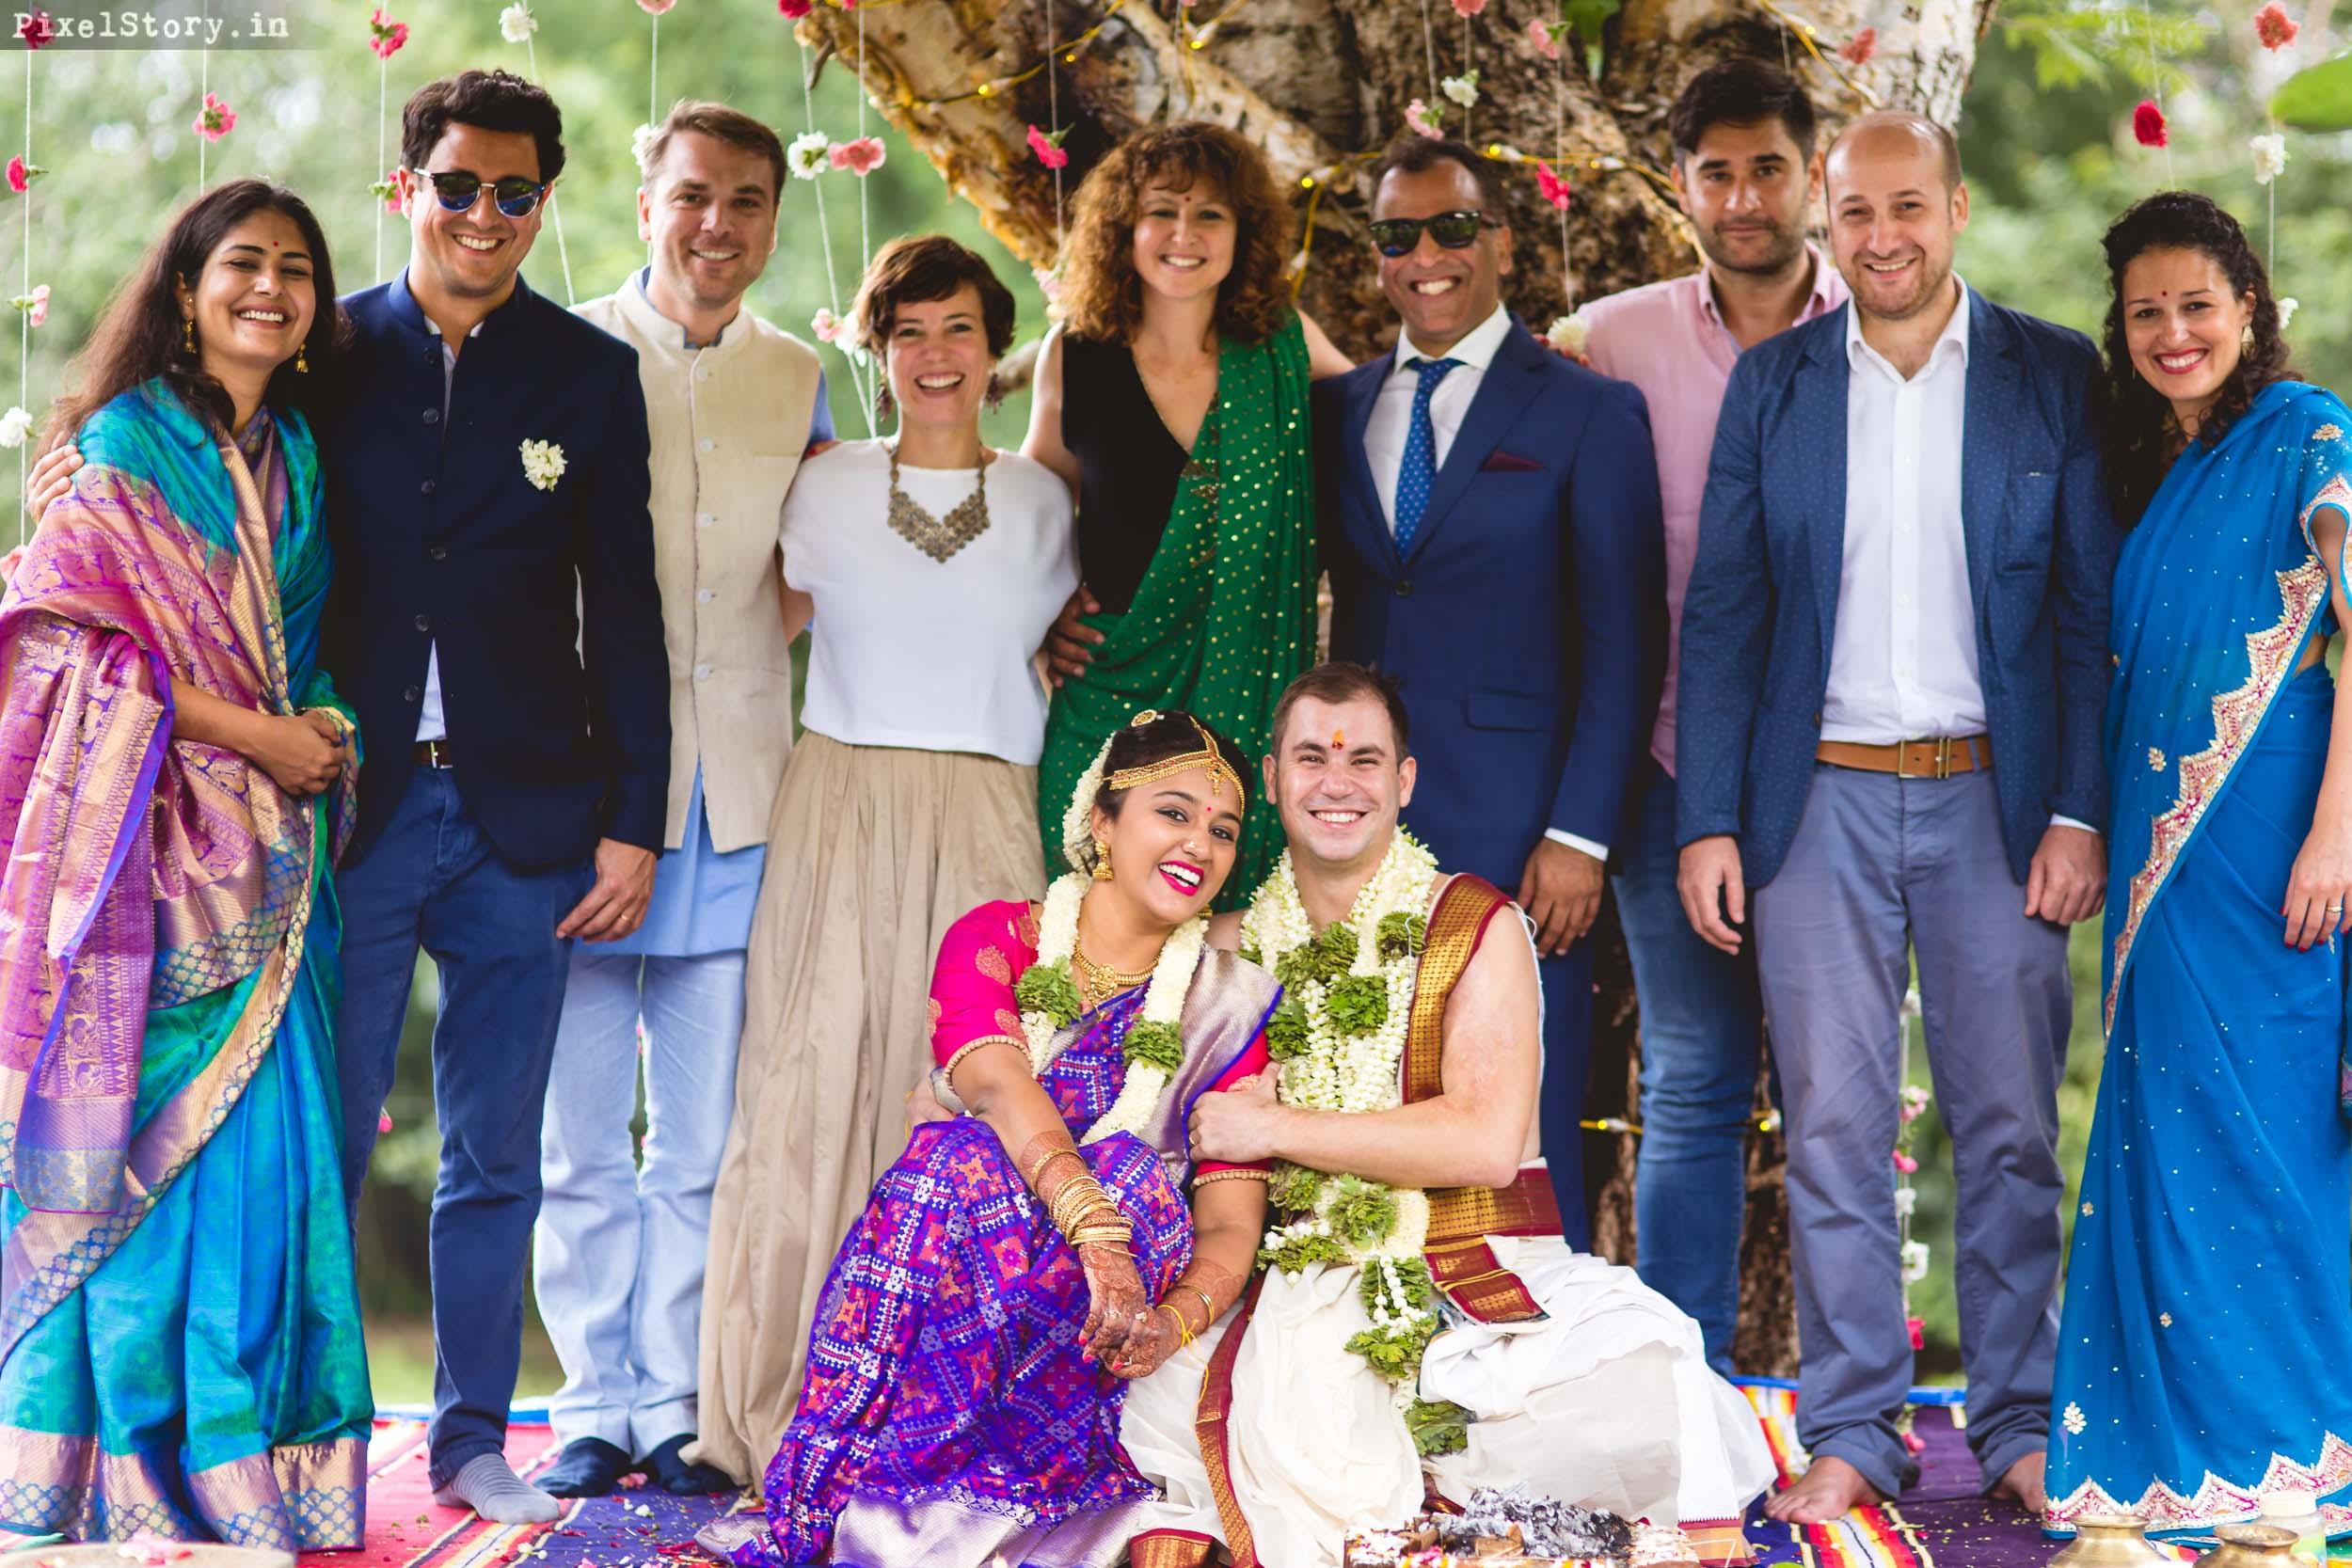 PixelStory-Jungle-Wedding-Photographer-Masinagudi-Indo-French085.jpg